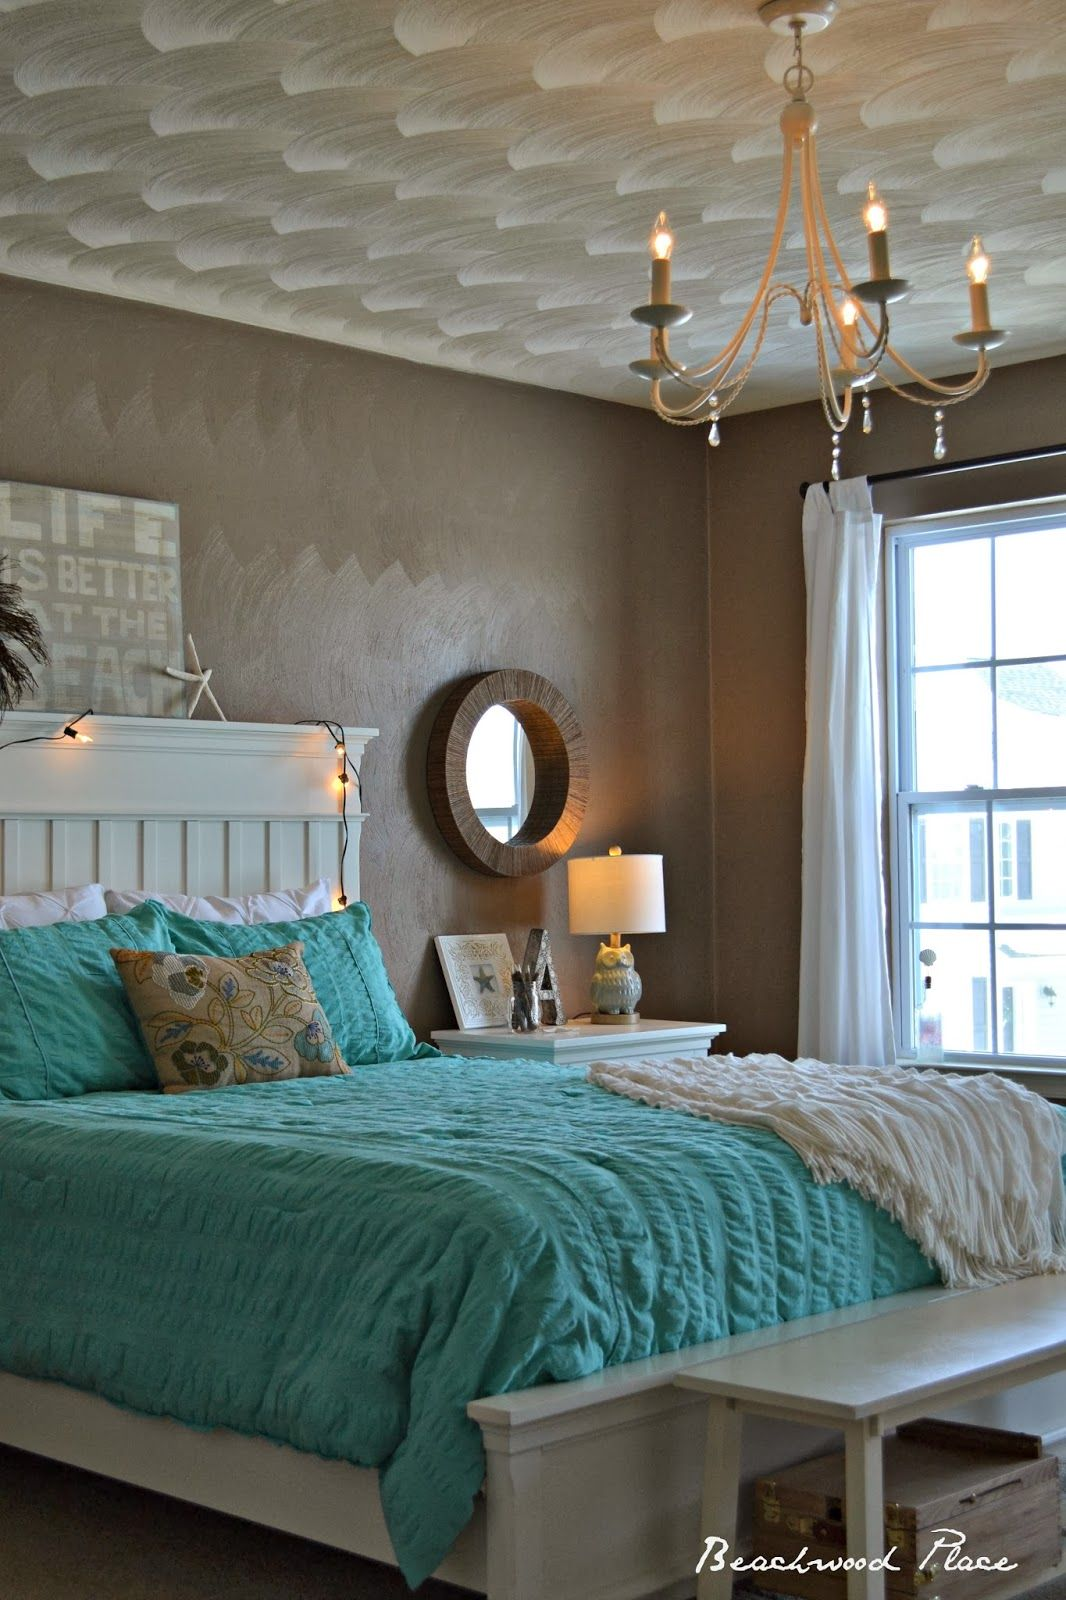 Master bedroom wall decor diy  Beachwood Place Diy crystal Chandelier  Cassidy  Pinterest